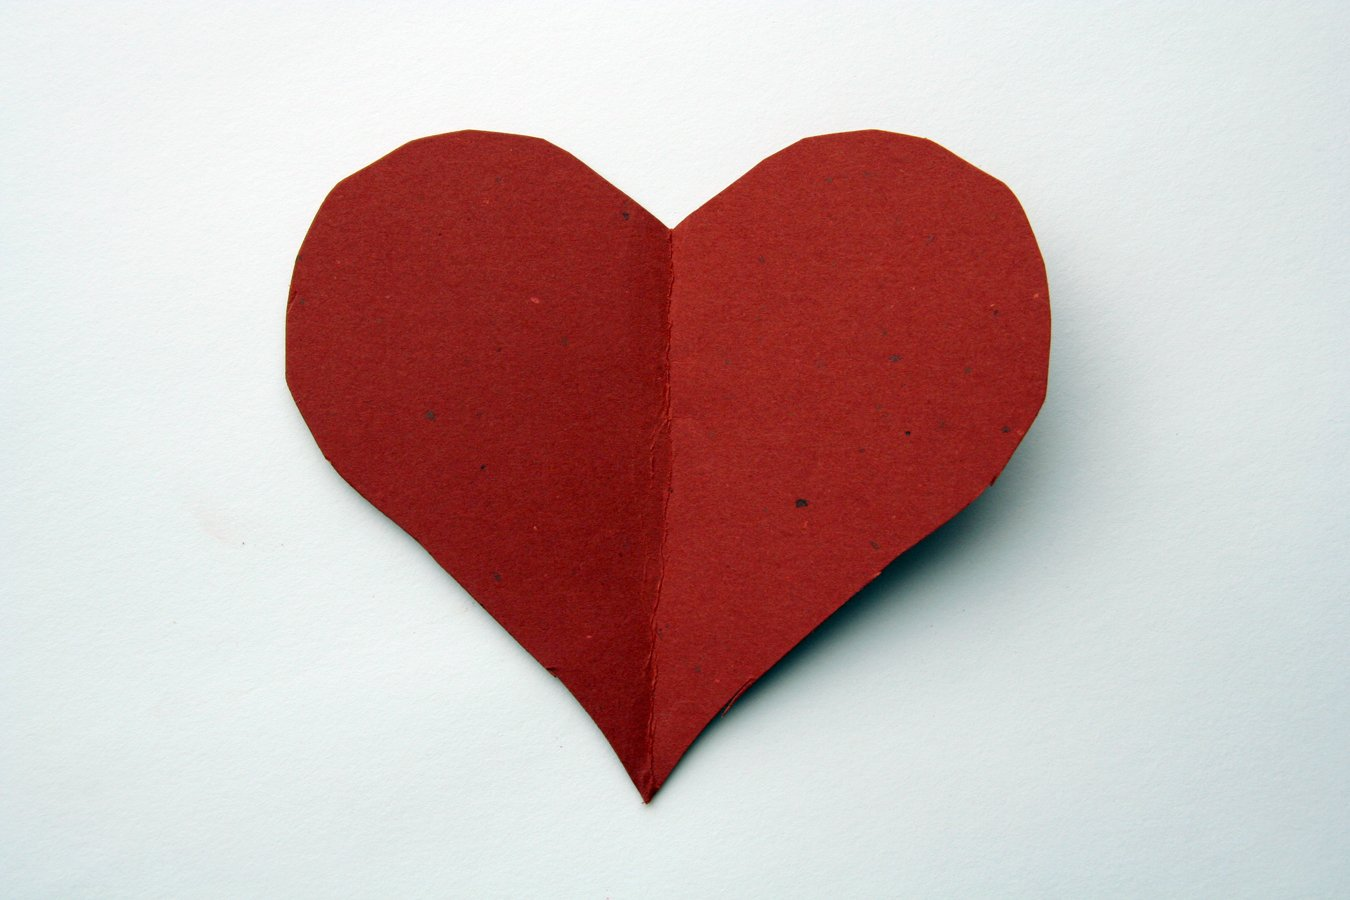 Картинки сердце из бумаги, утро картинки осеннее